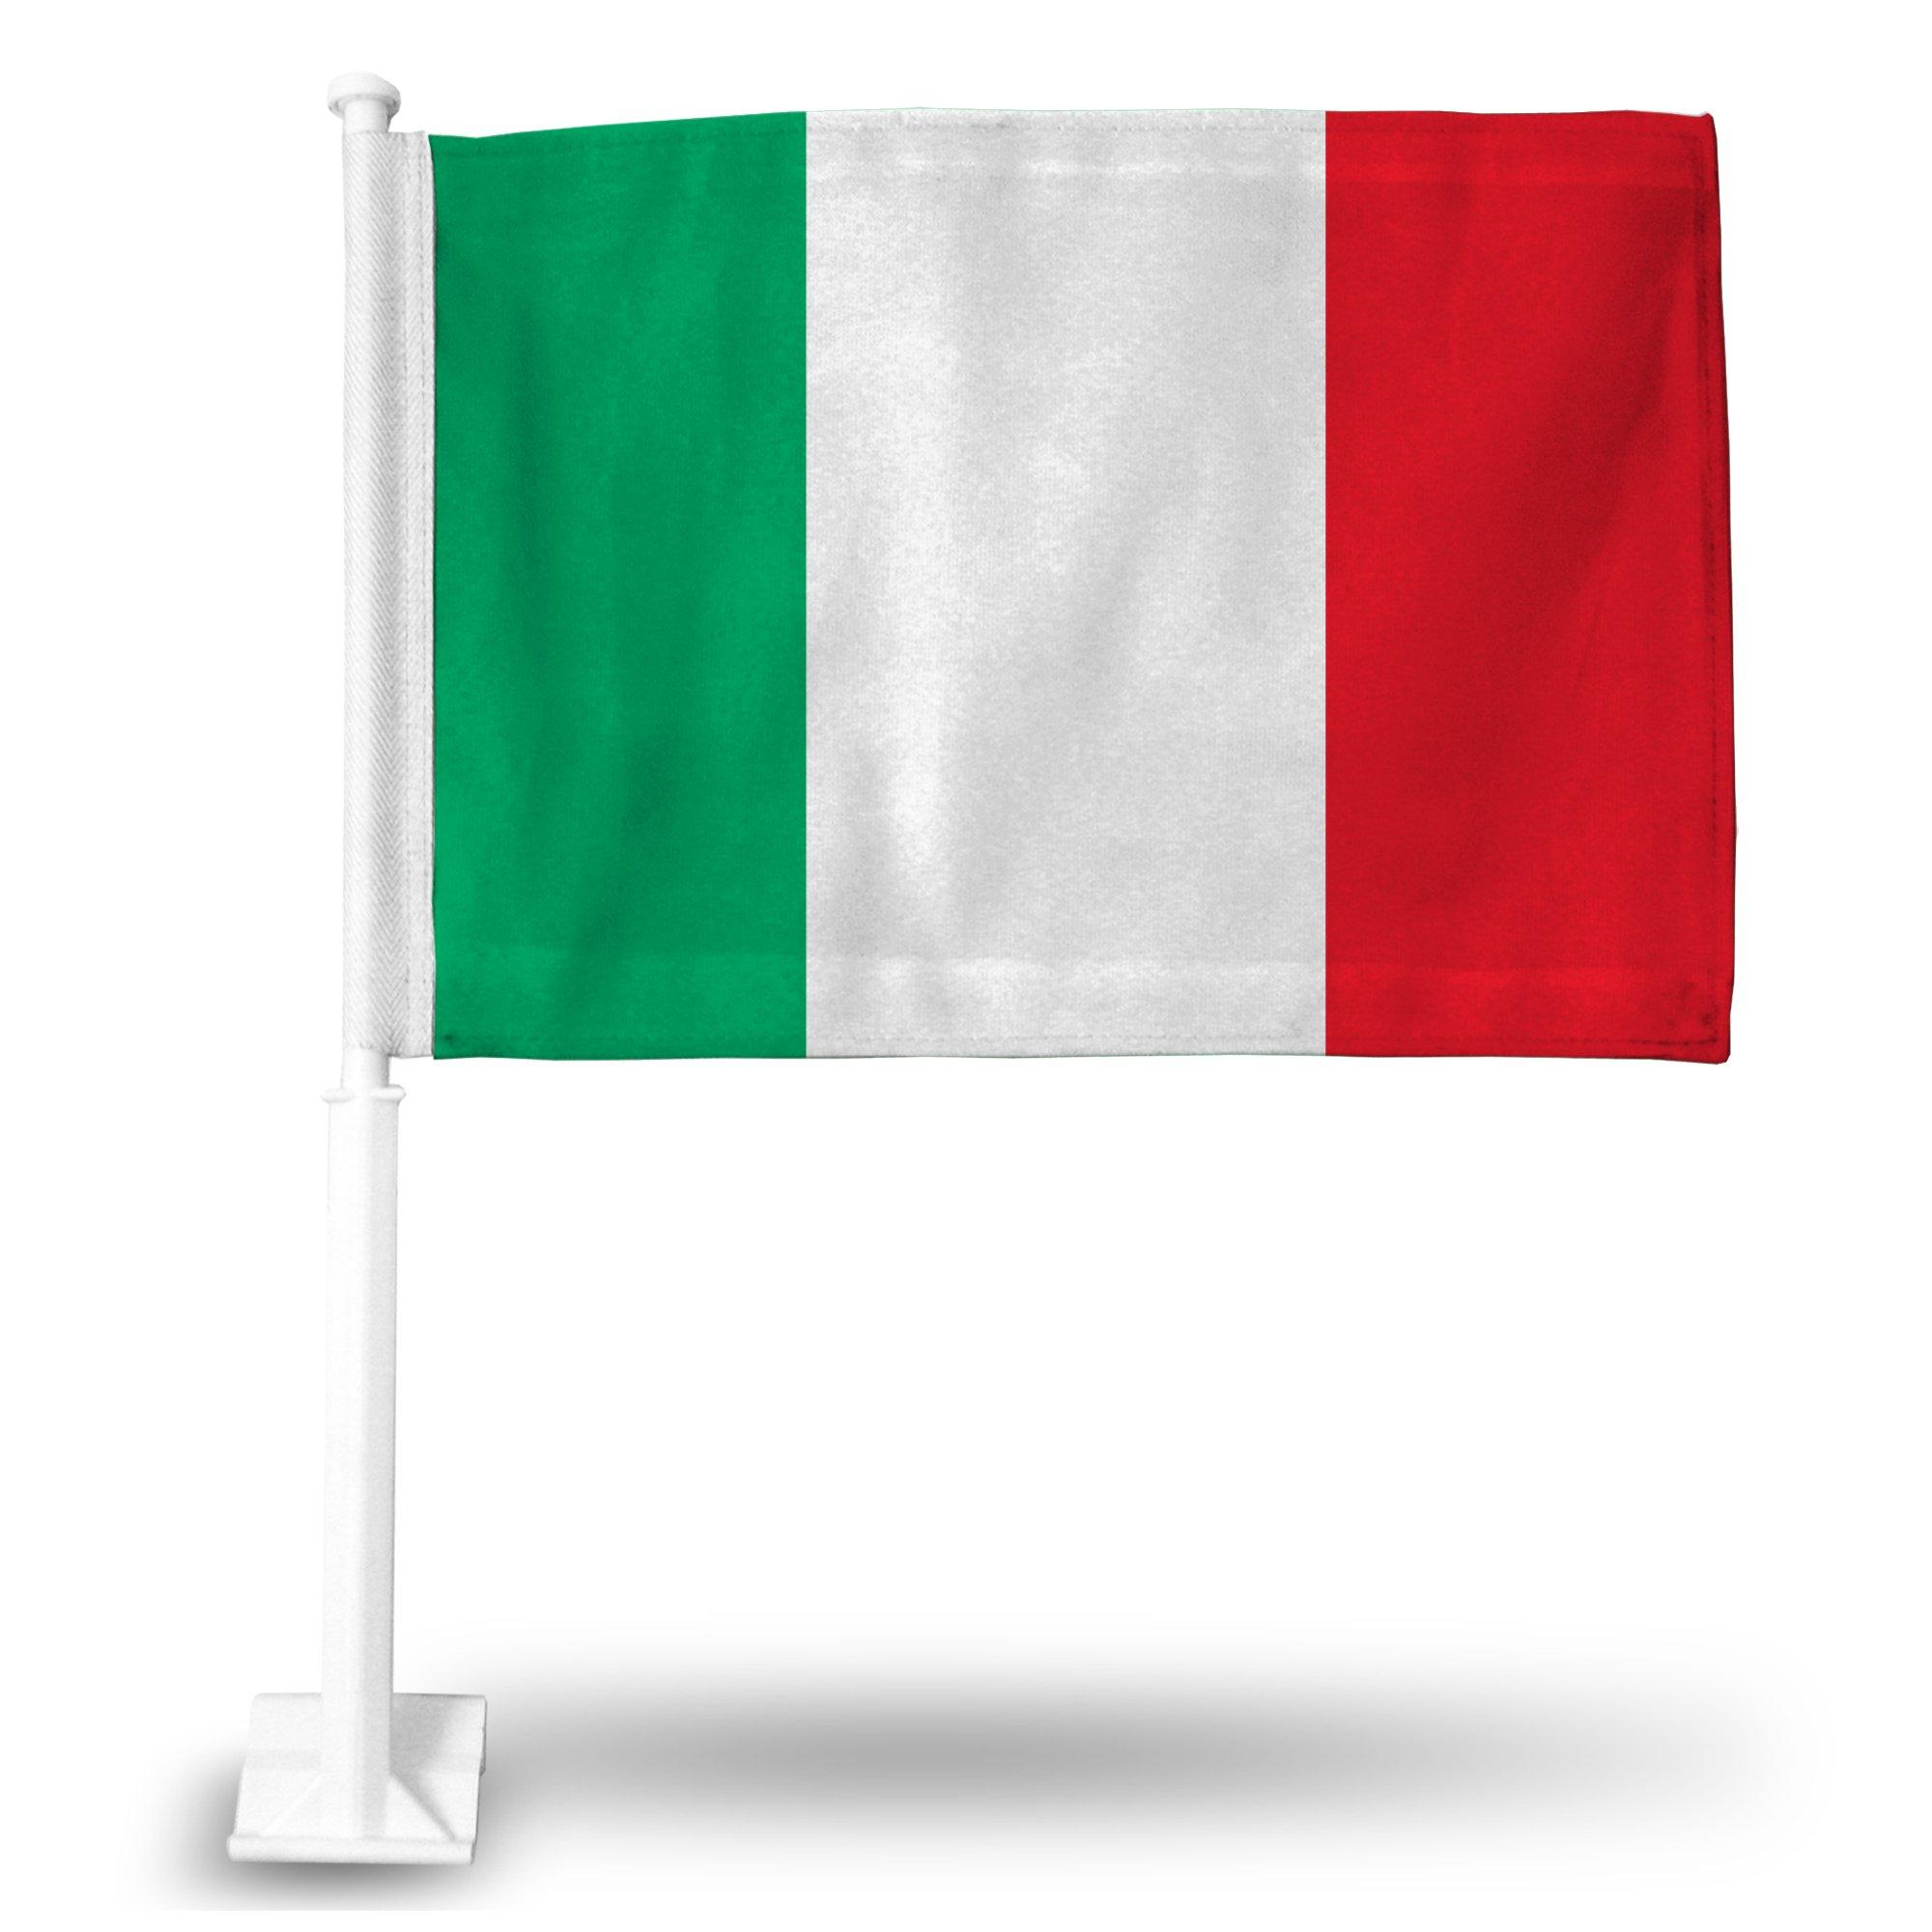 Rico National Soccer Team Car Flag, with White Pole